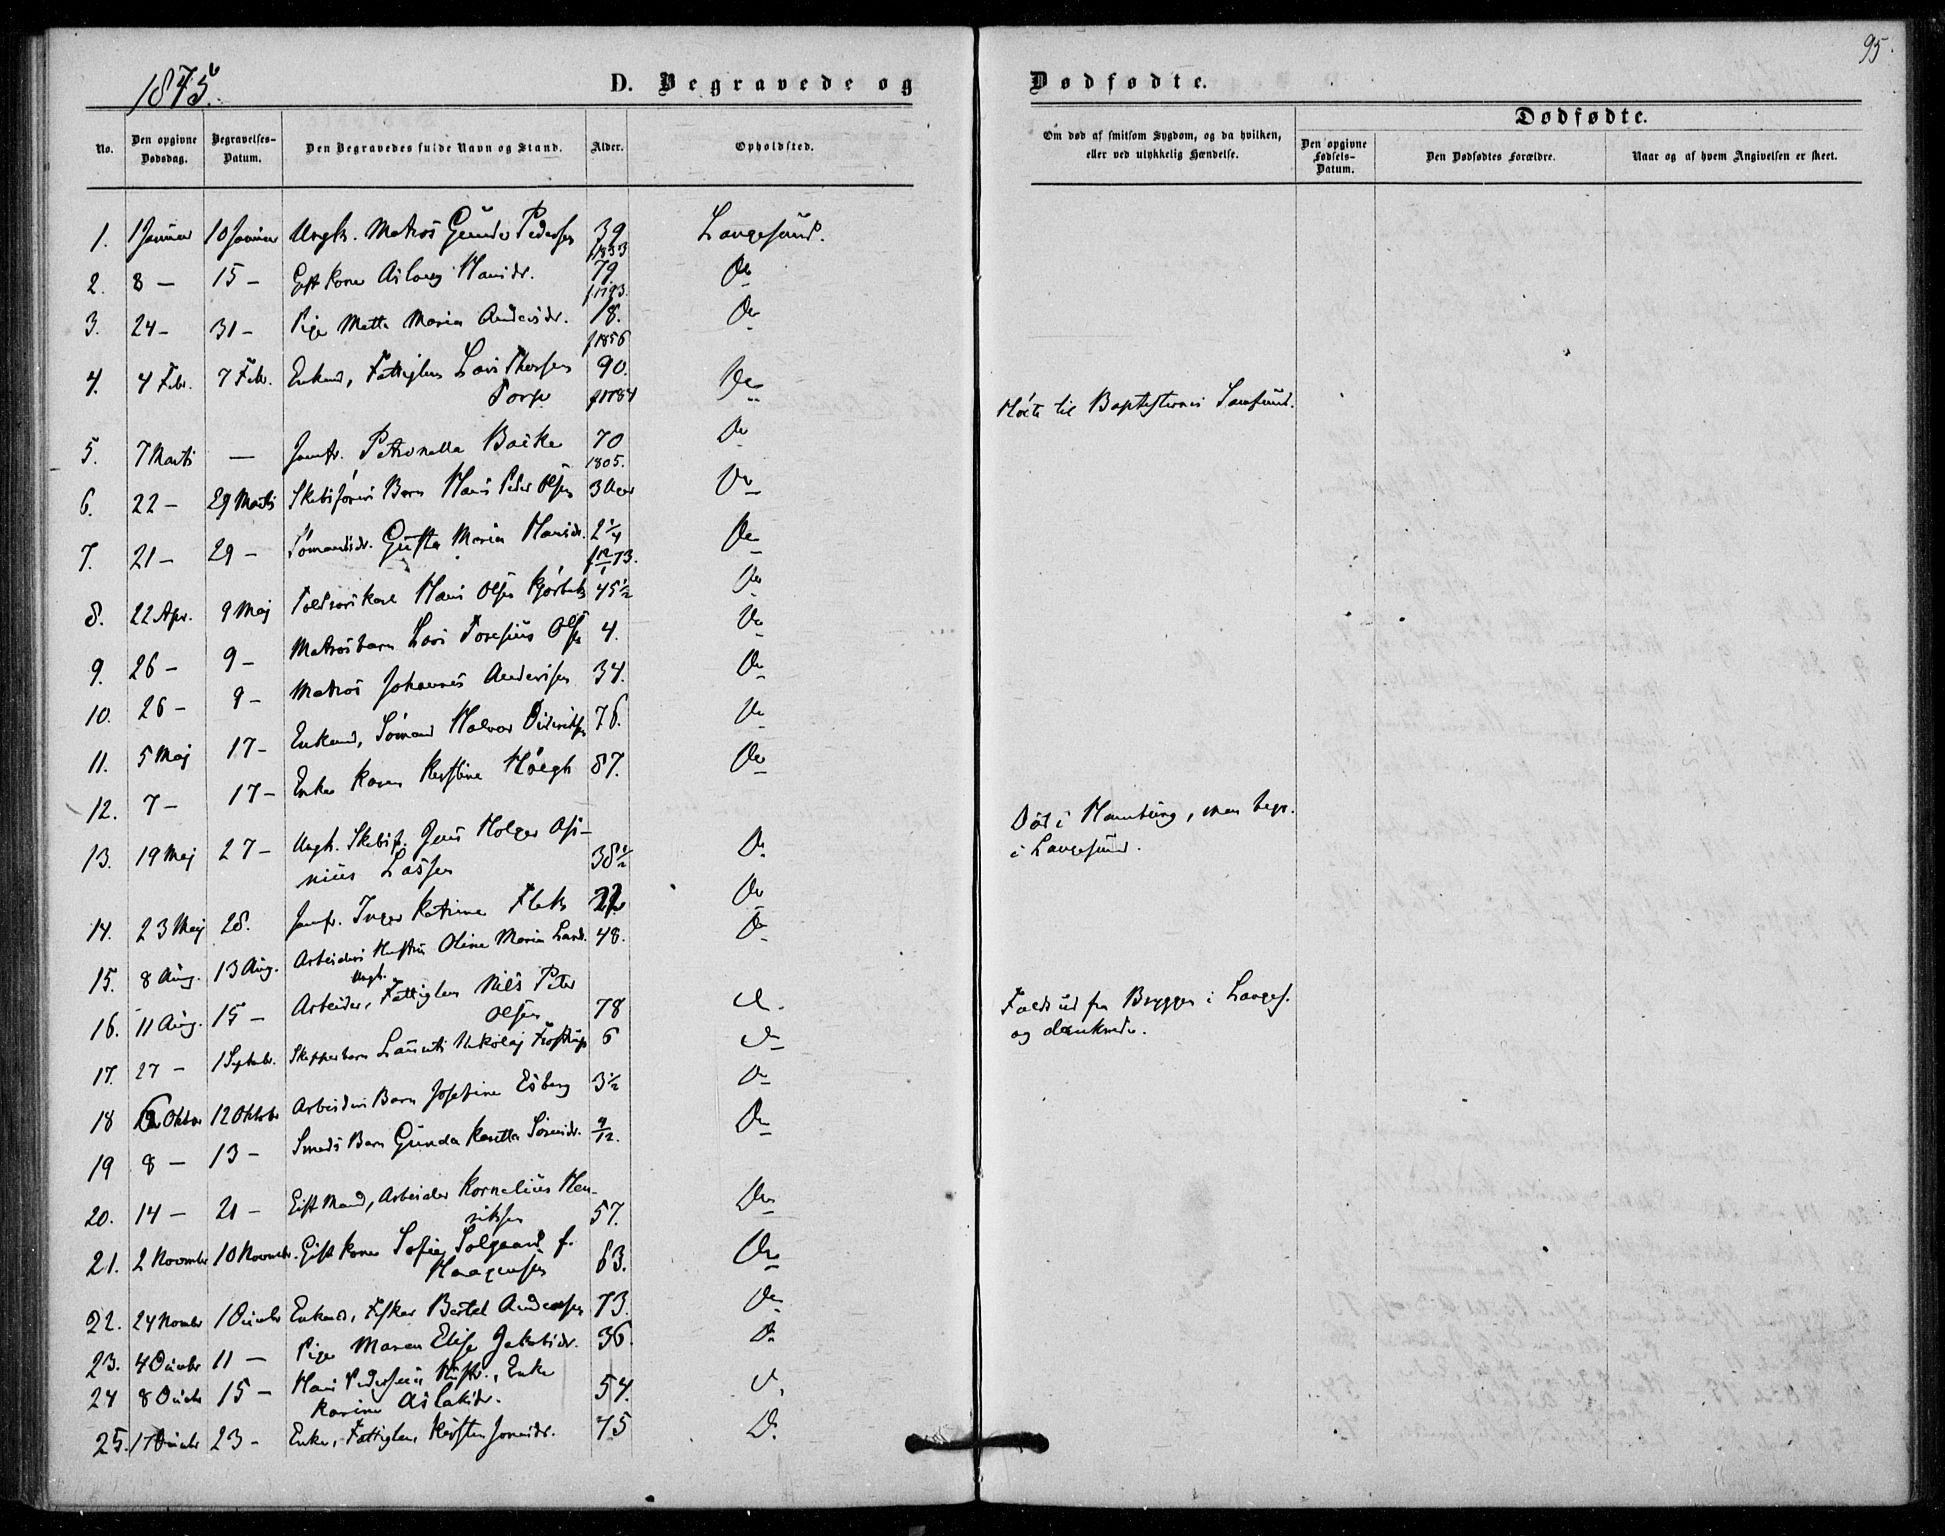 SAKO, Langesund kirkebøker, F/Fa/L0001: Ministerialbok nr. 1, 1870-1877, s. 95